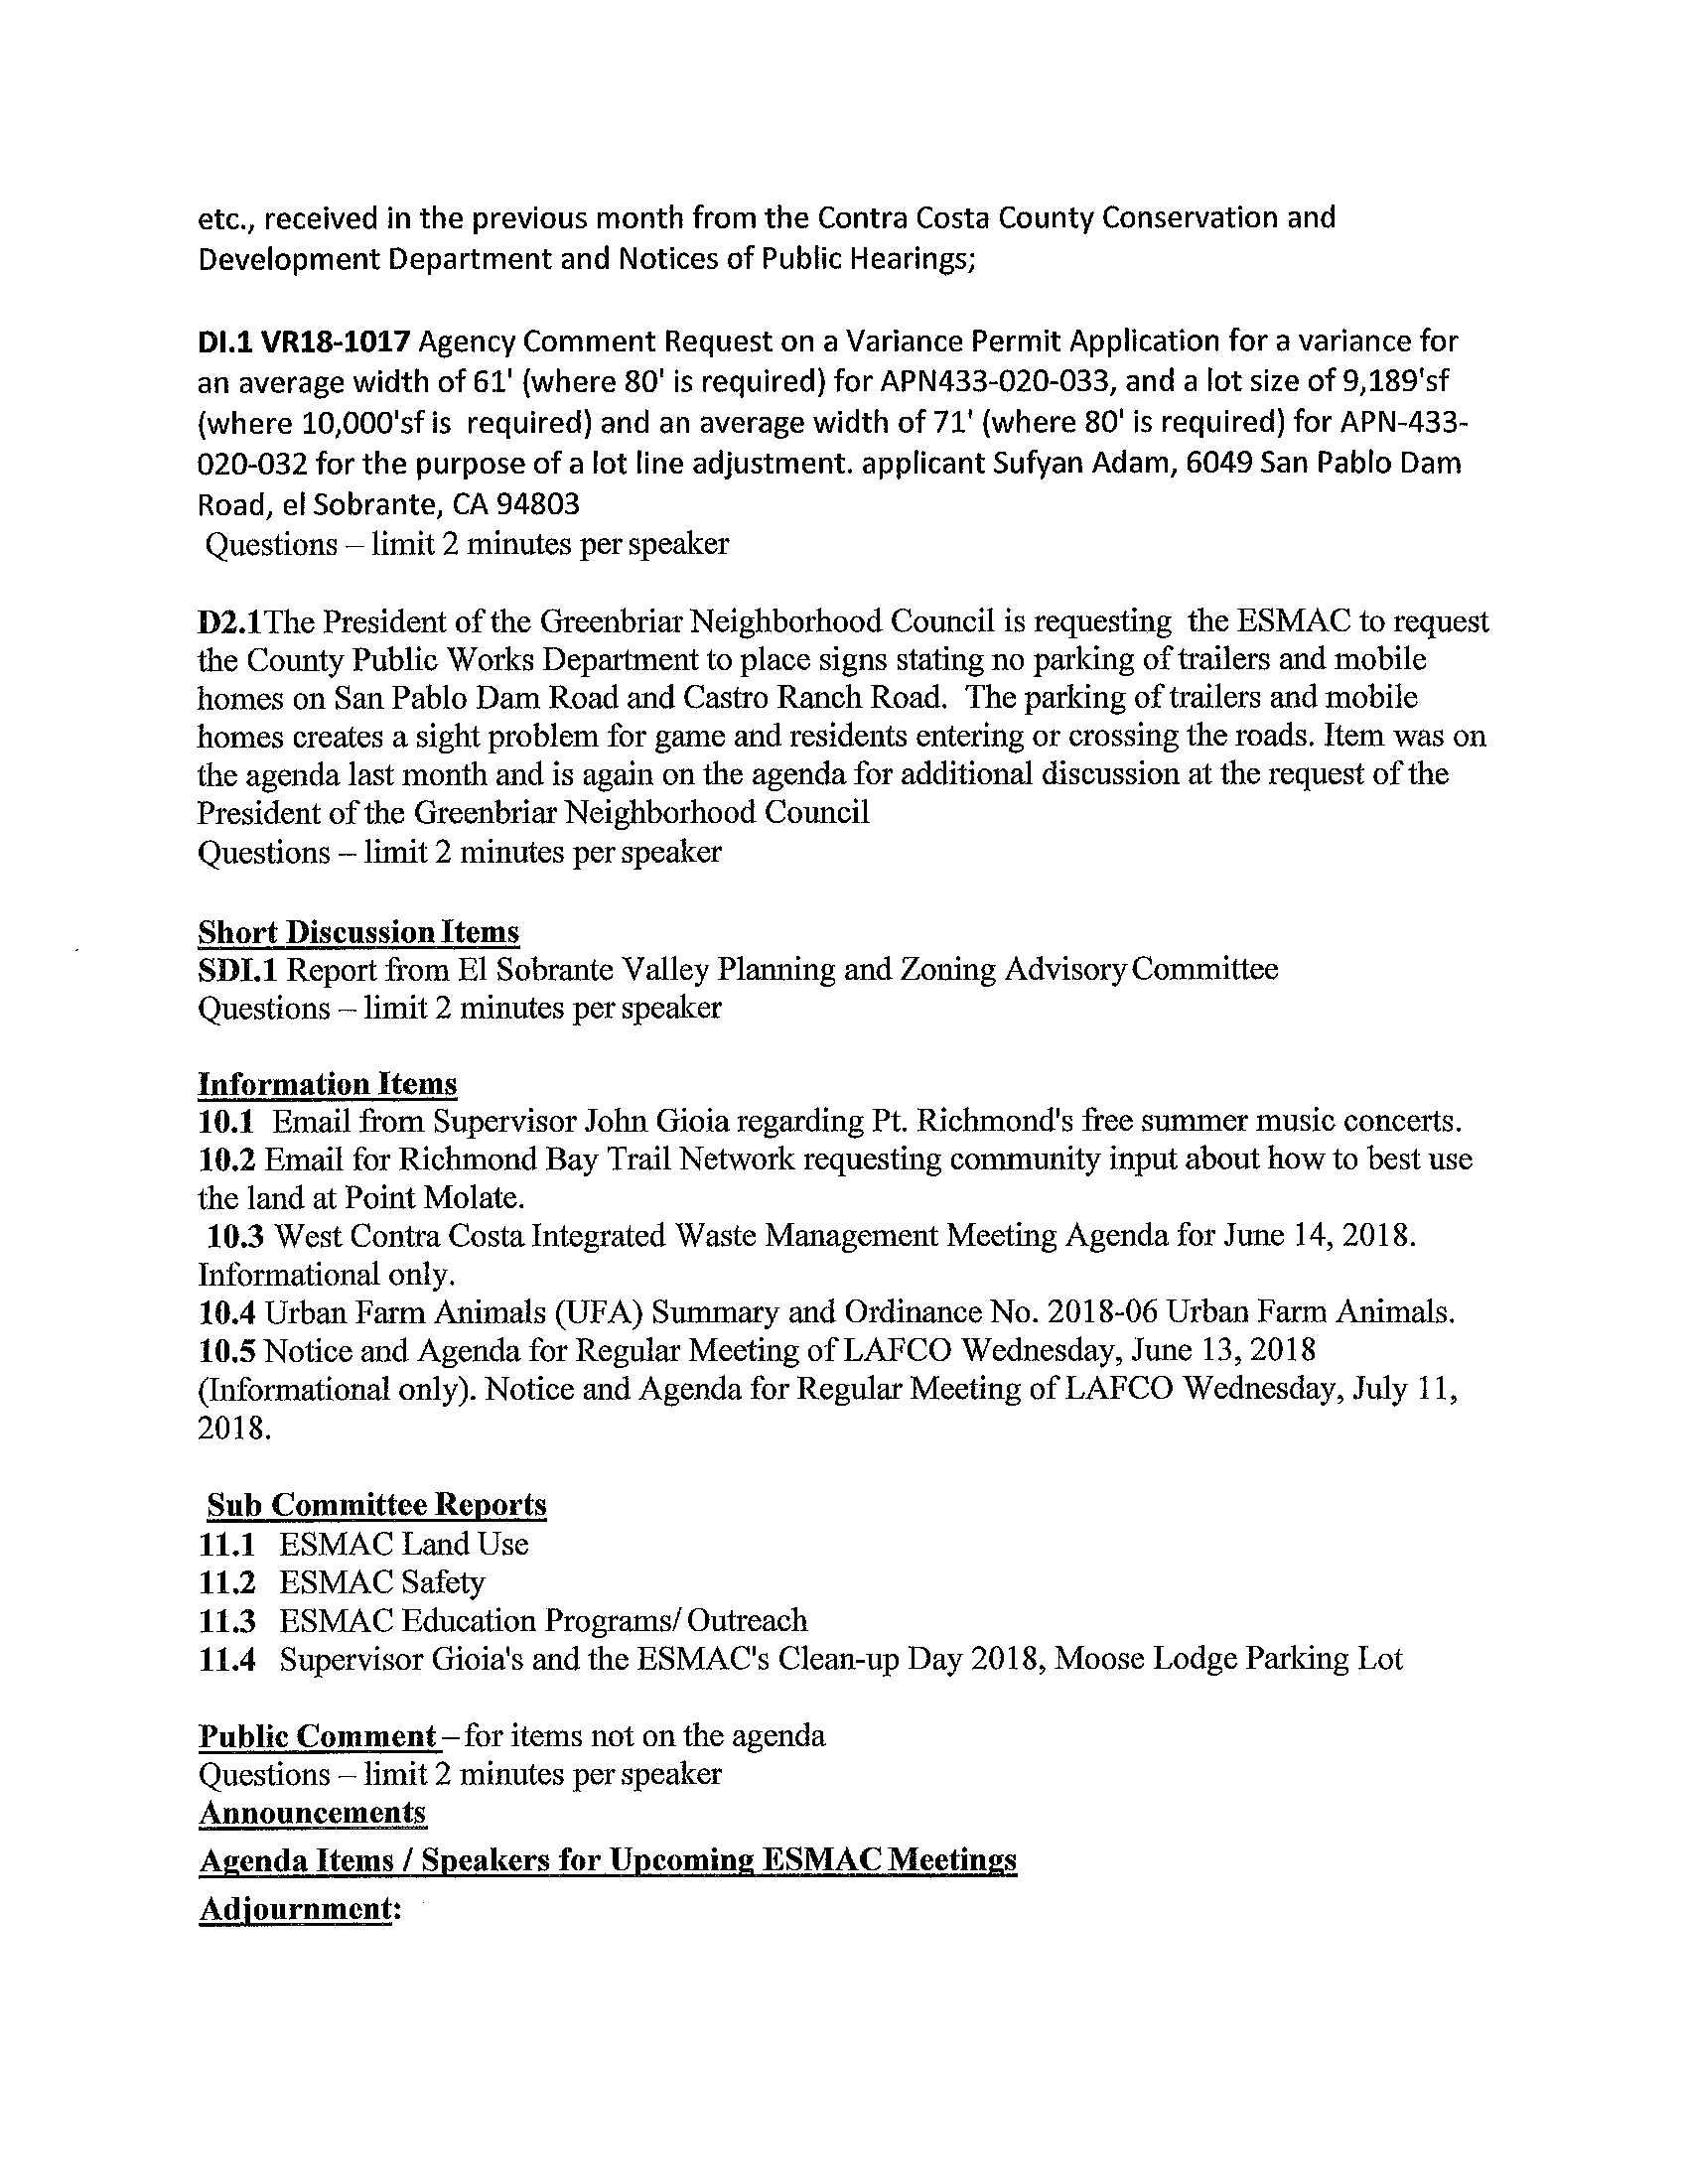 ESMAC Agenda 7.11.2018 (36 Pages)_2.jpg